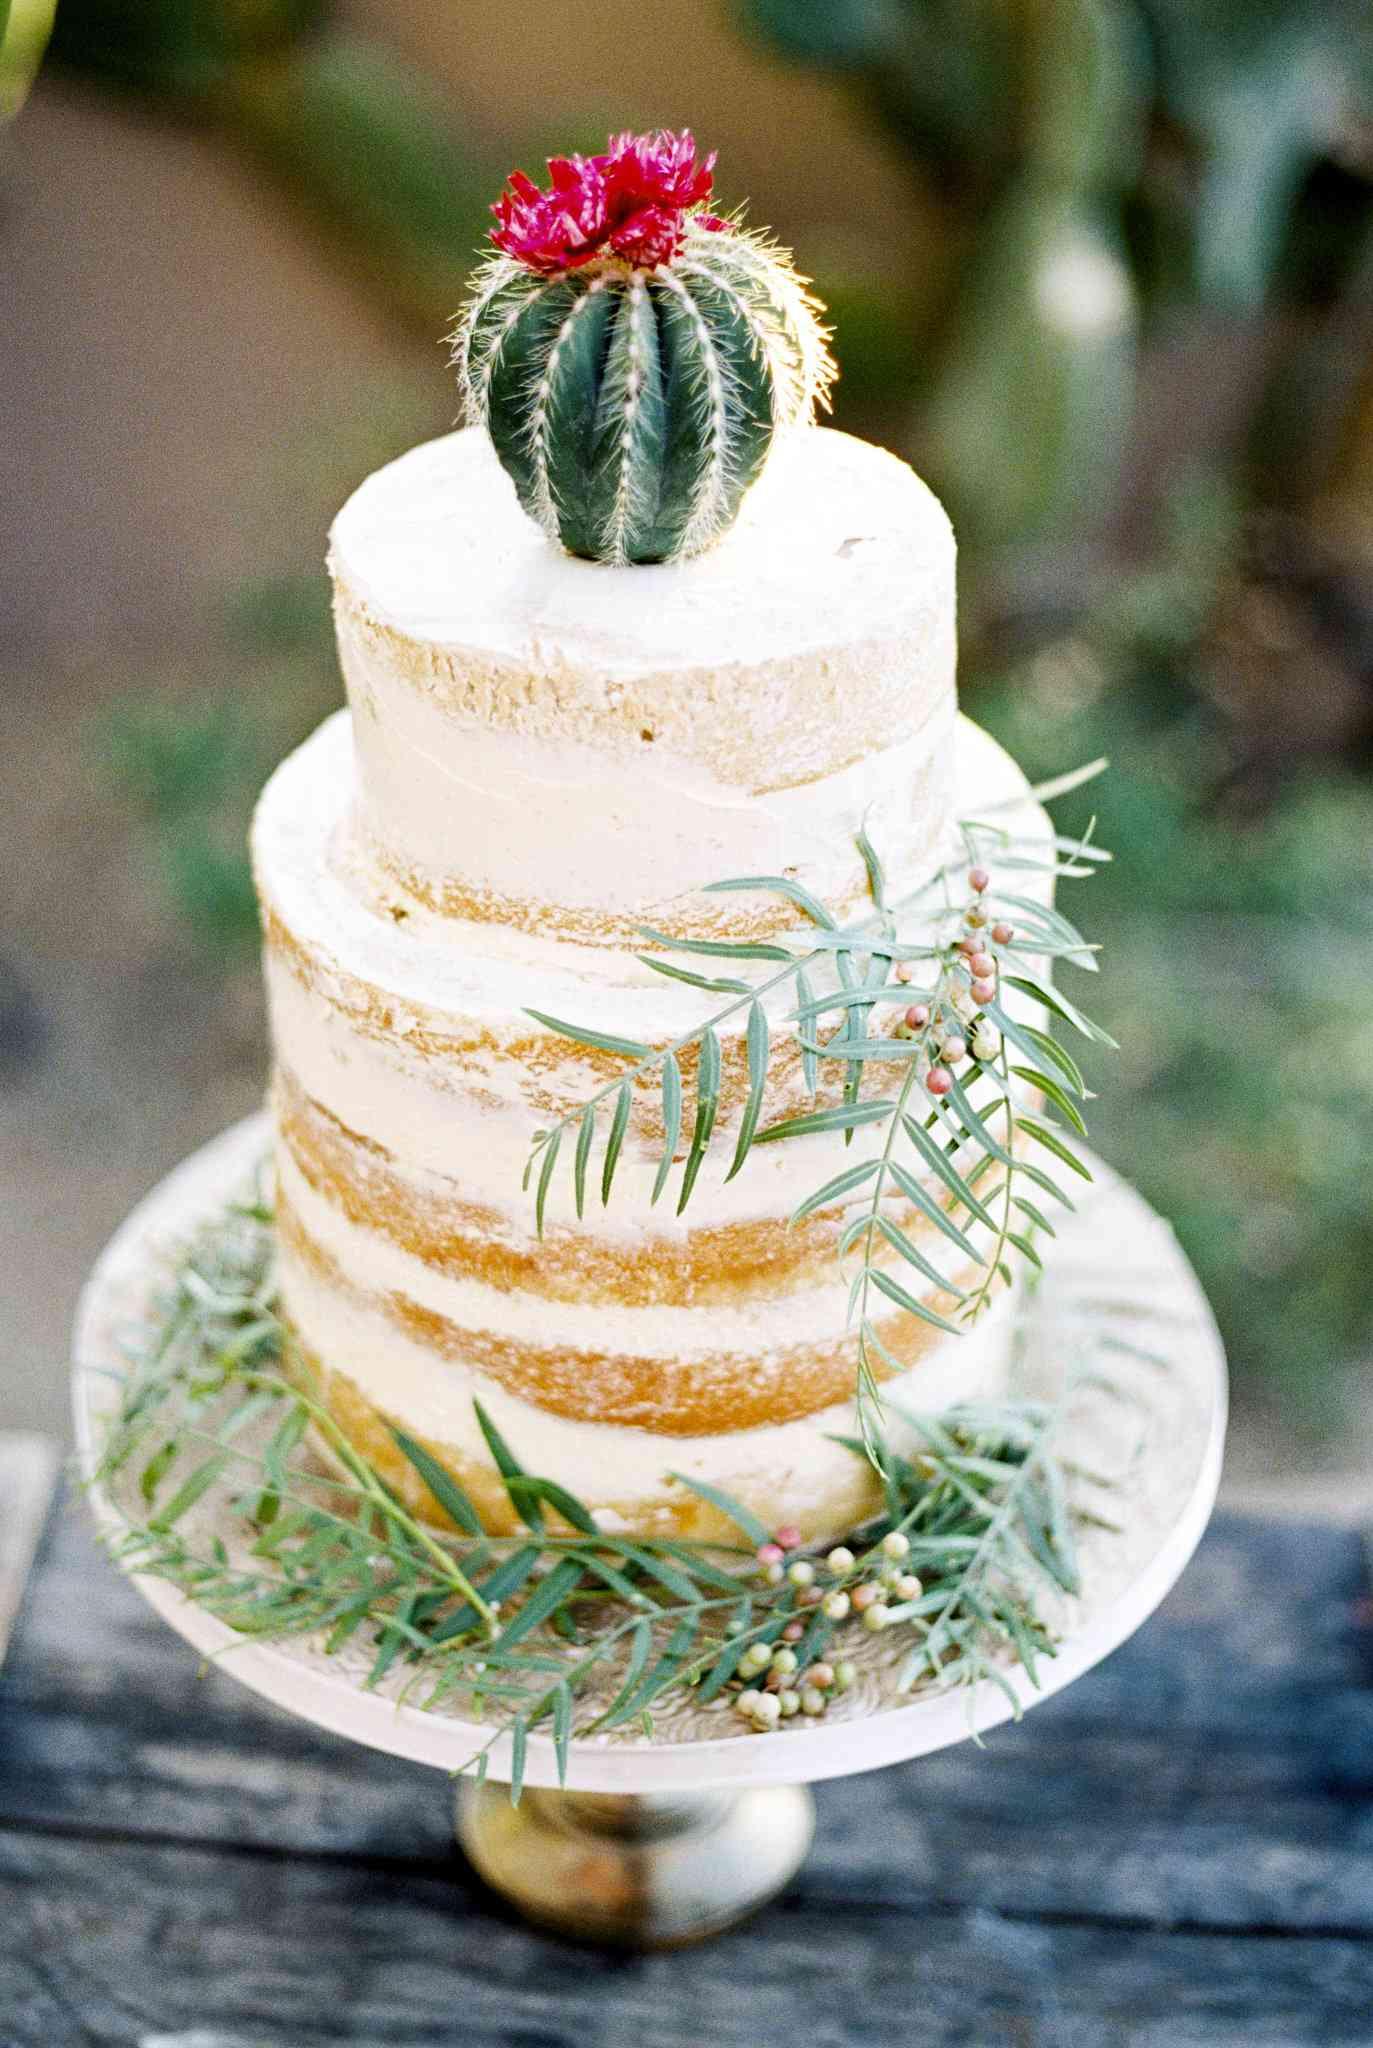 Cactus Decorated Wedding Cake